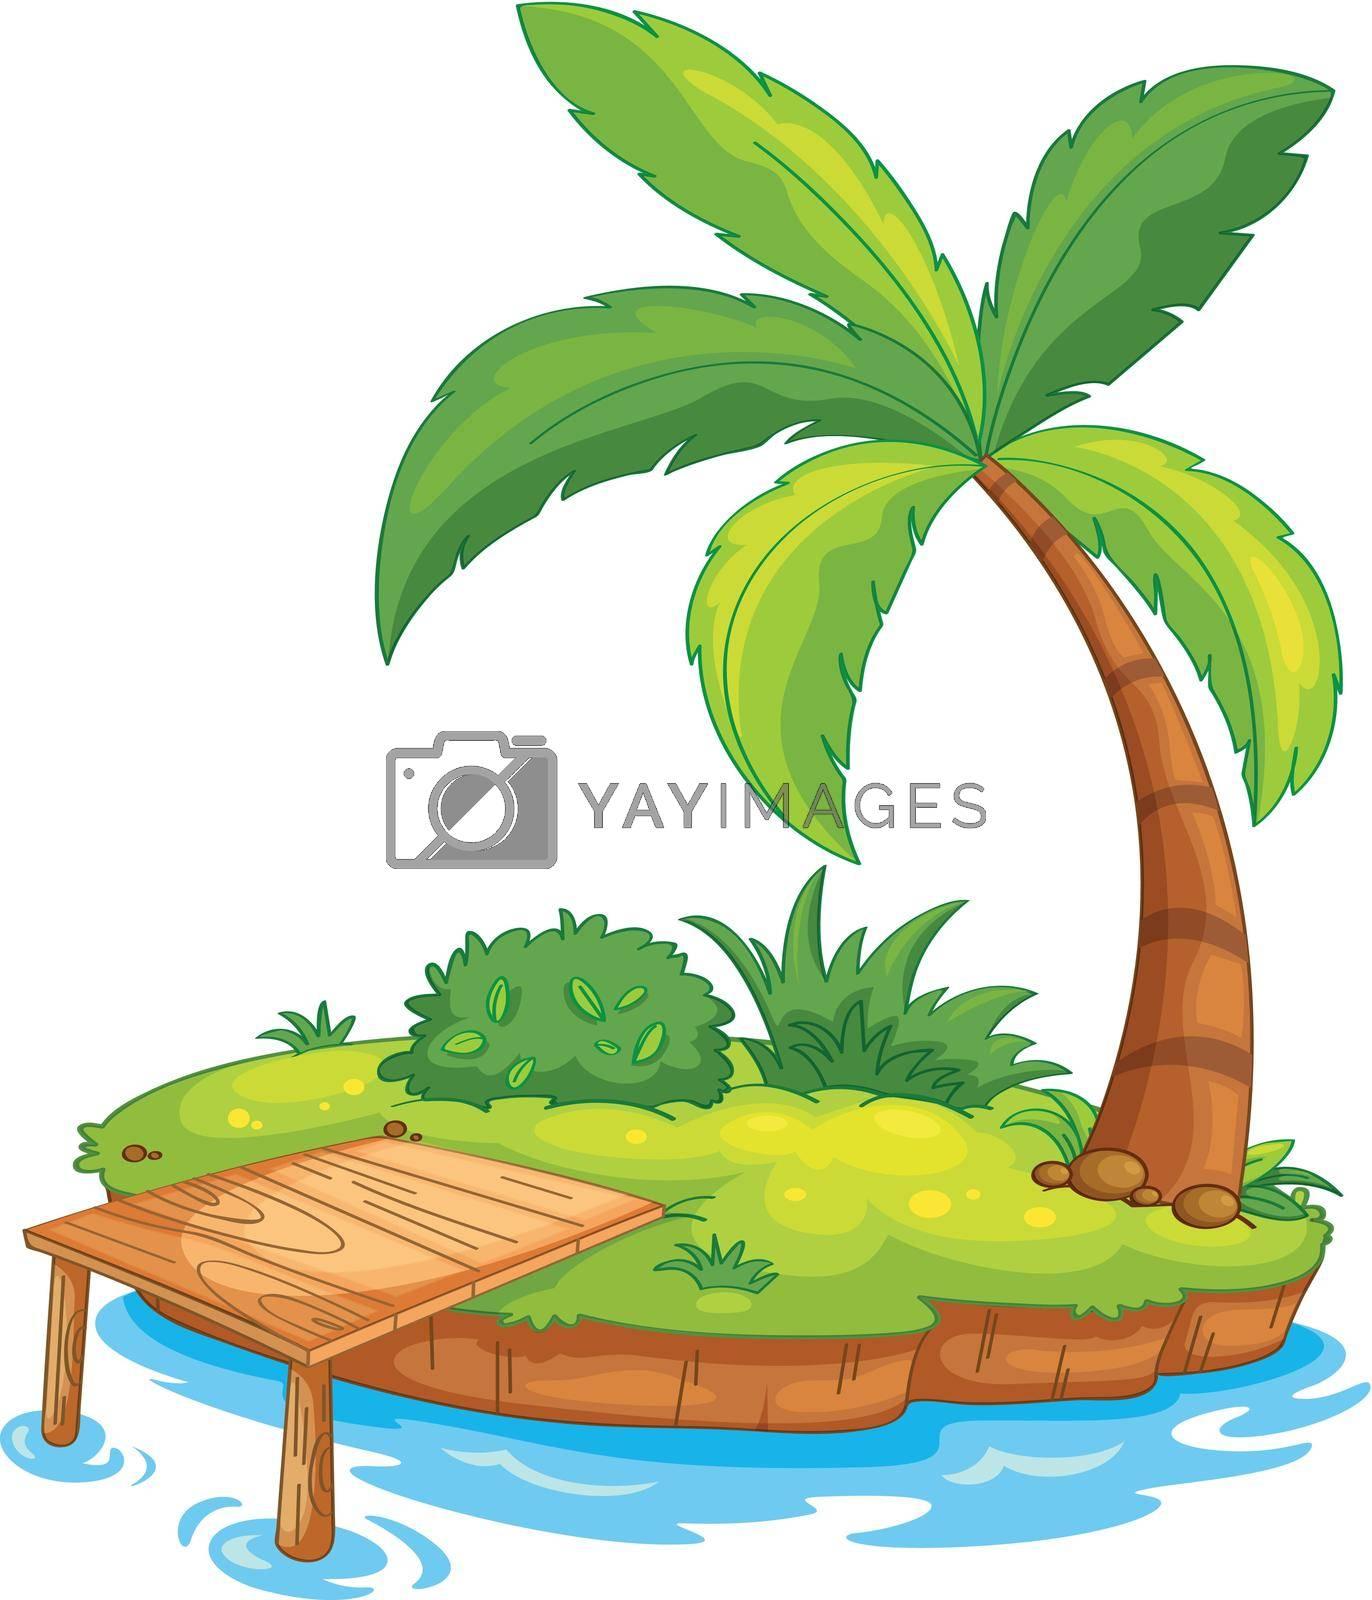 Illustration of a tiny island